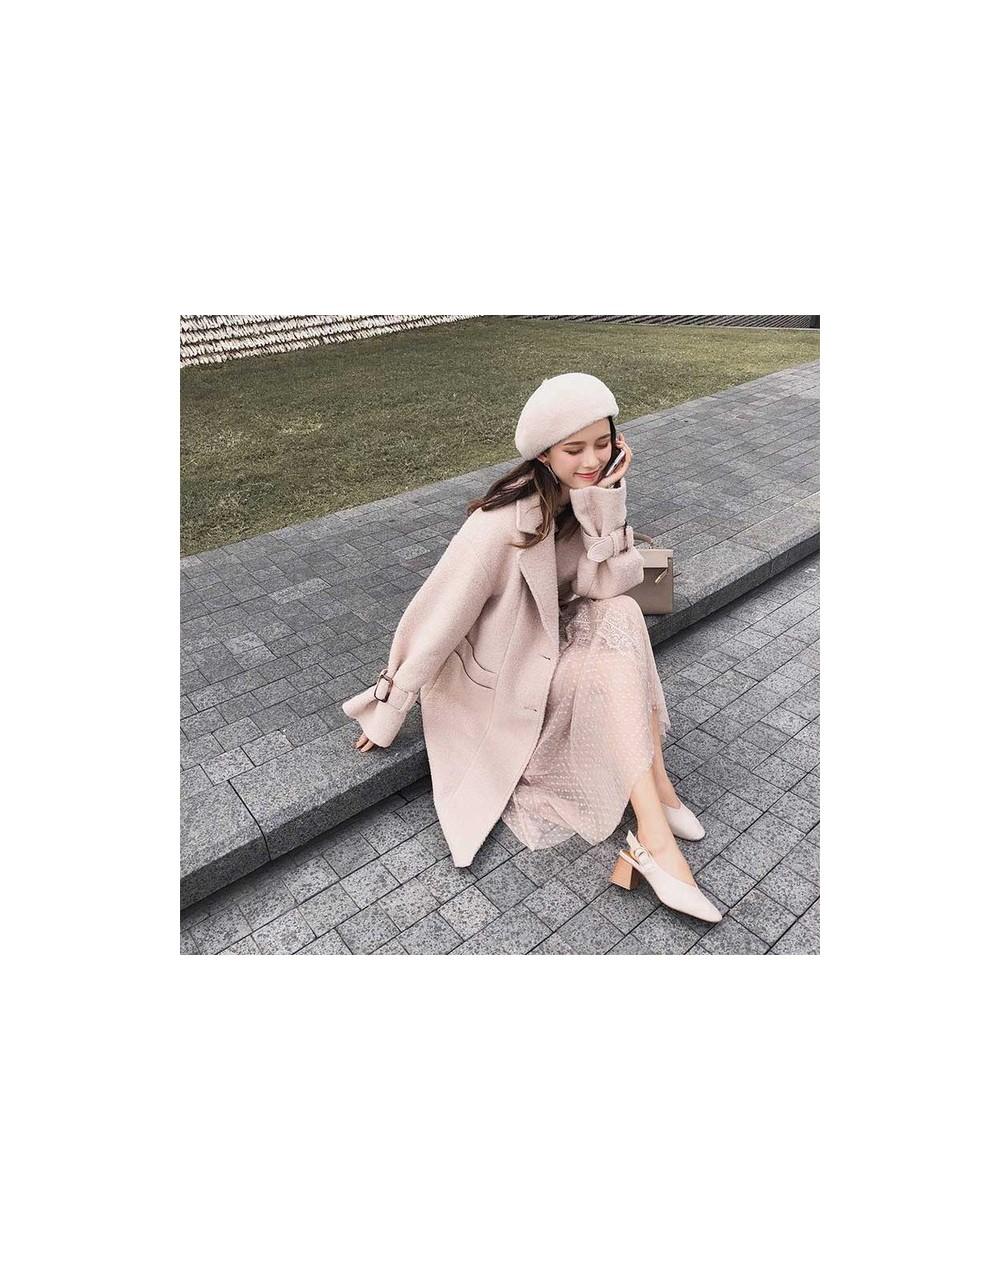 Mishow 2018 Autumn Winter New Coat Women Long Sleeve Jacket Casual Overcoat MX18D9670 - Khaki - 423071896197